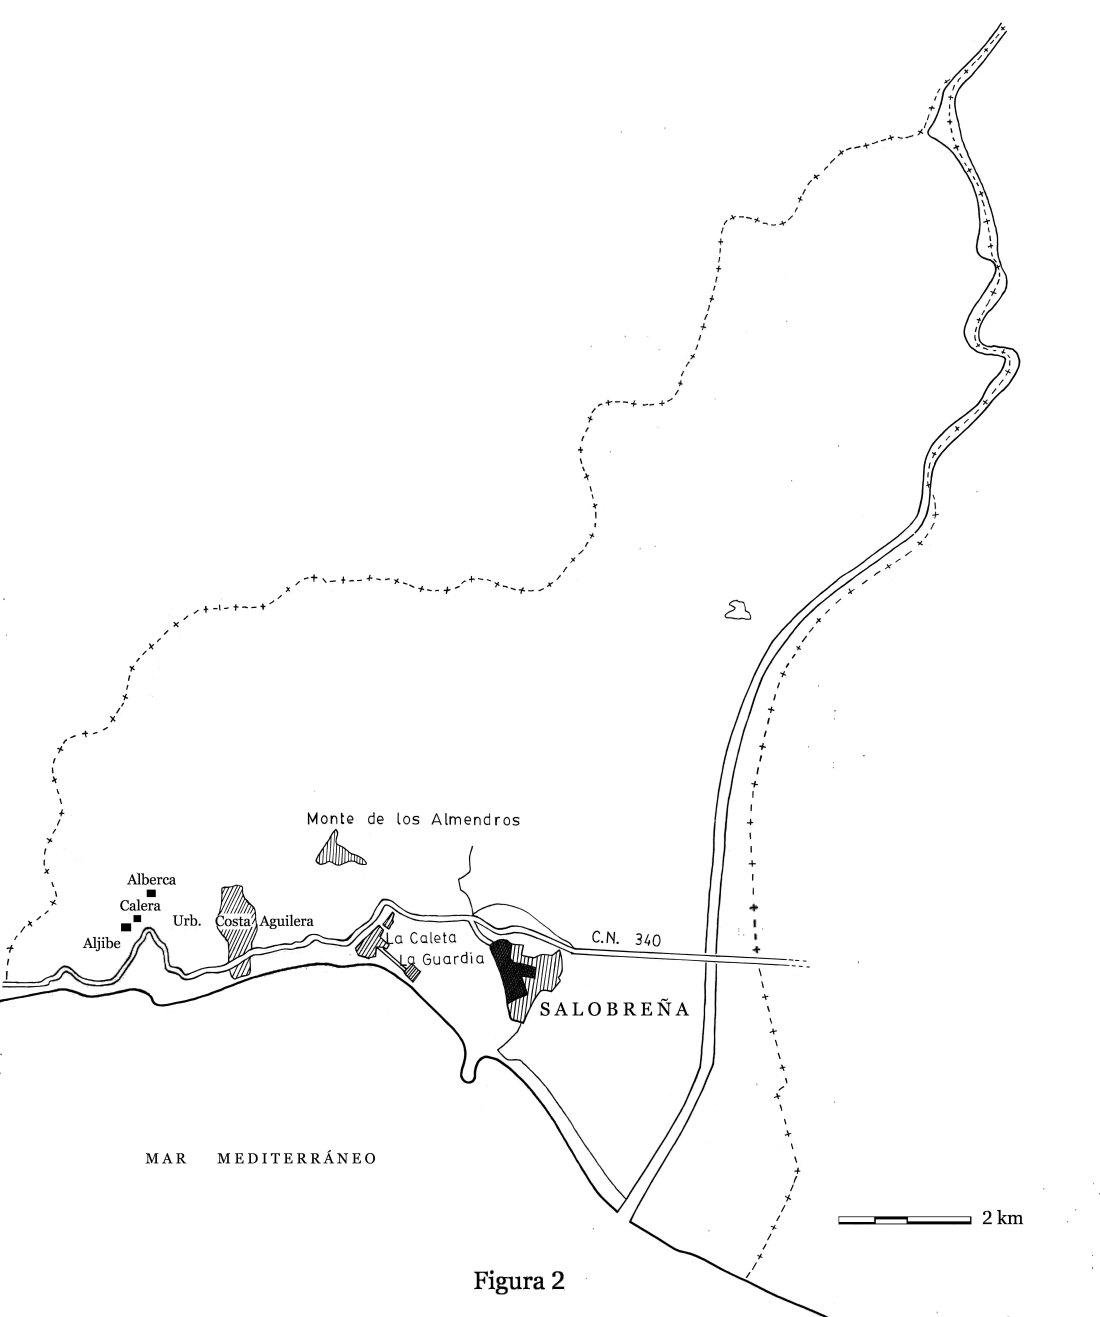 9A plano SALOBREÑA 2 Binder1 - copia